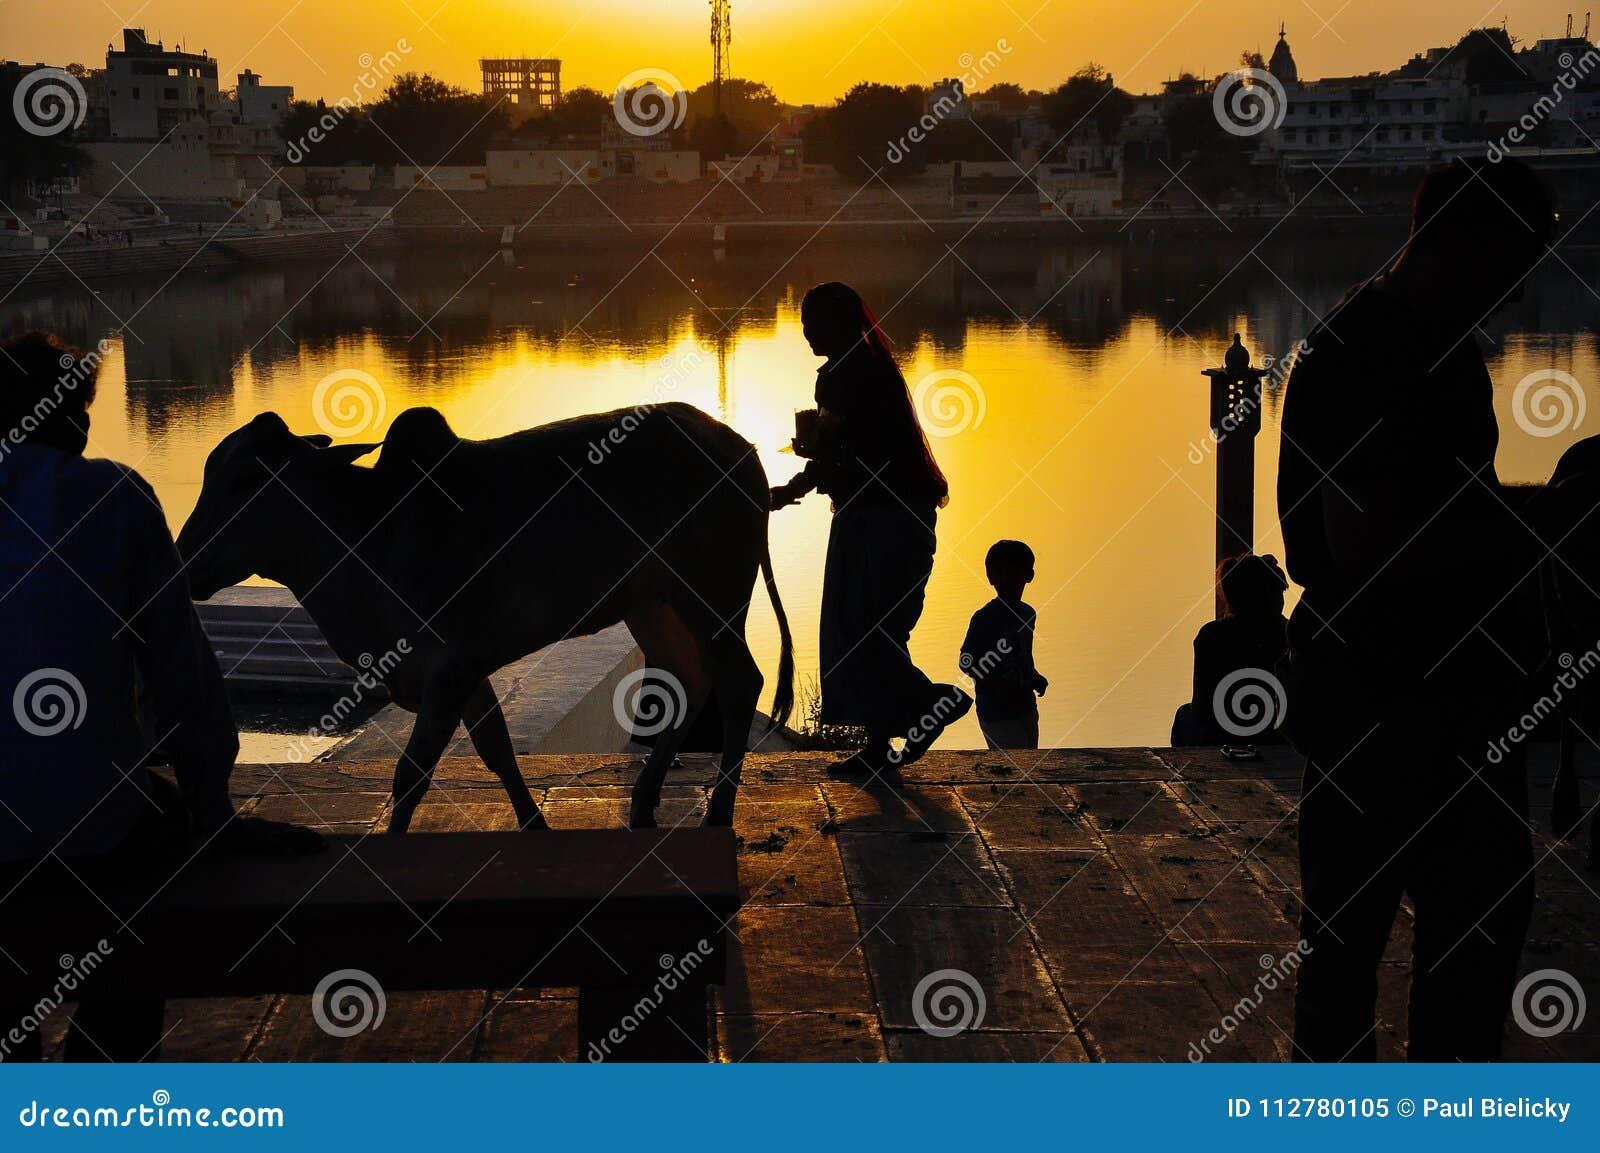 Lake Pushkar in Pushkar, India.